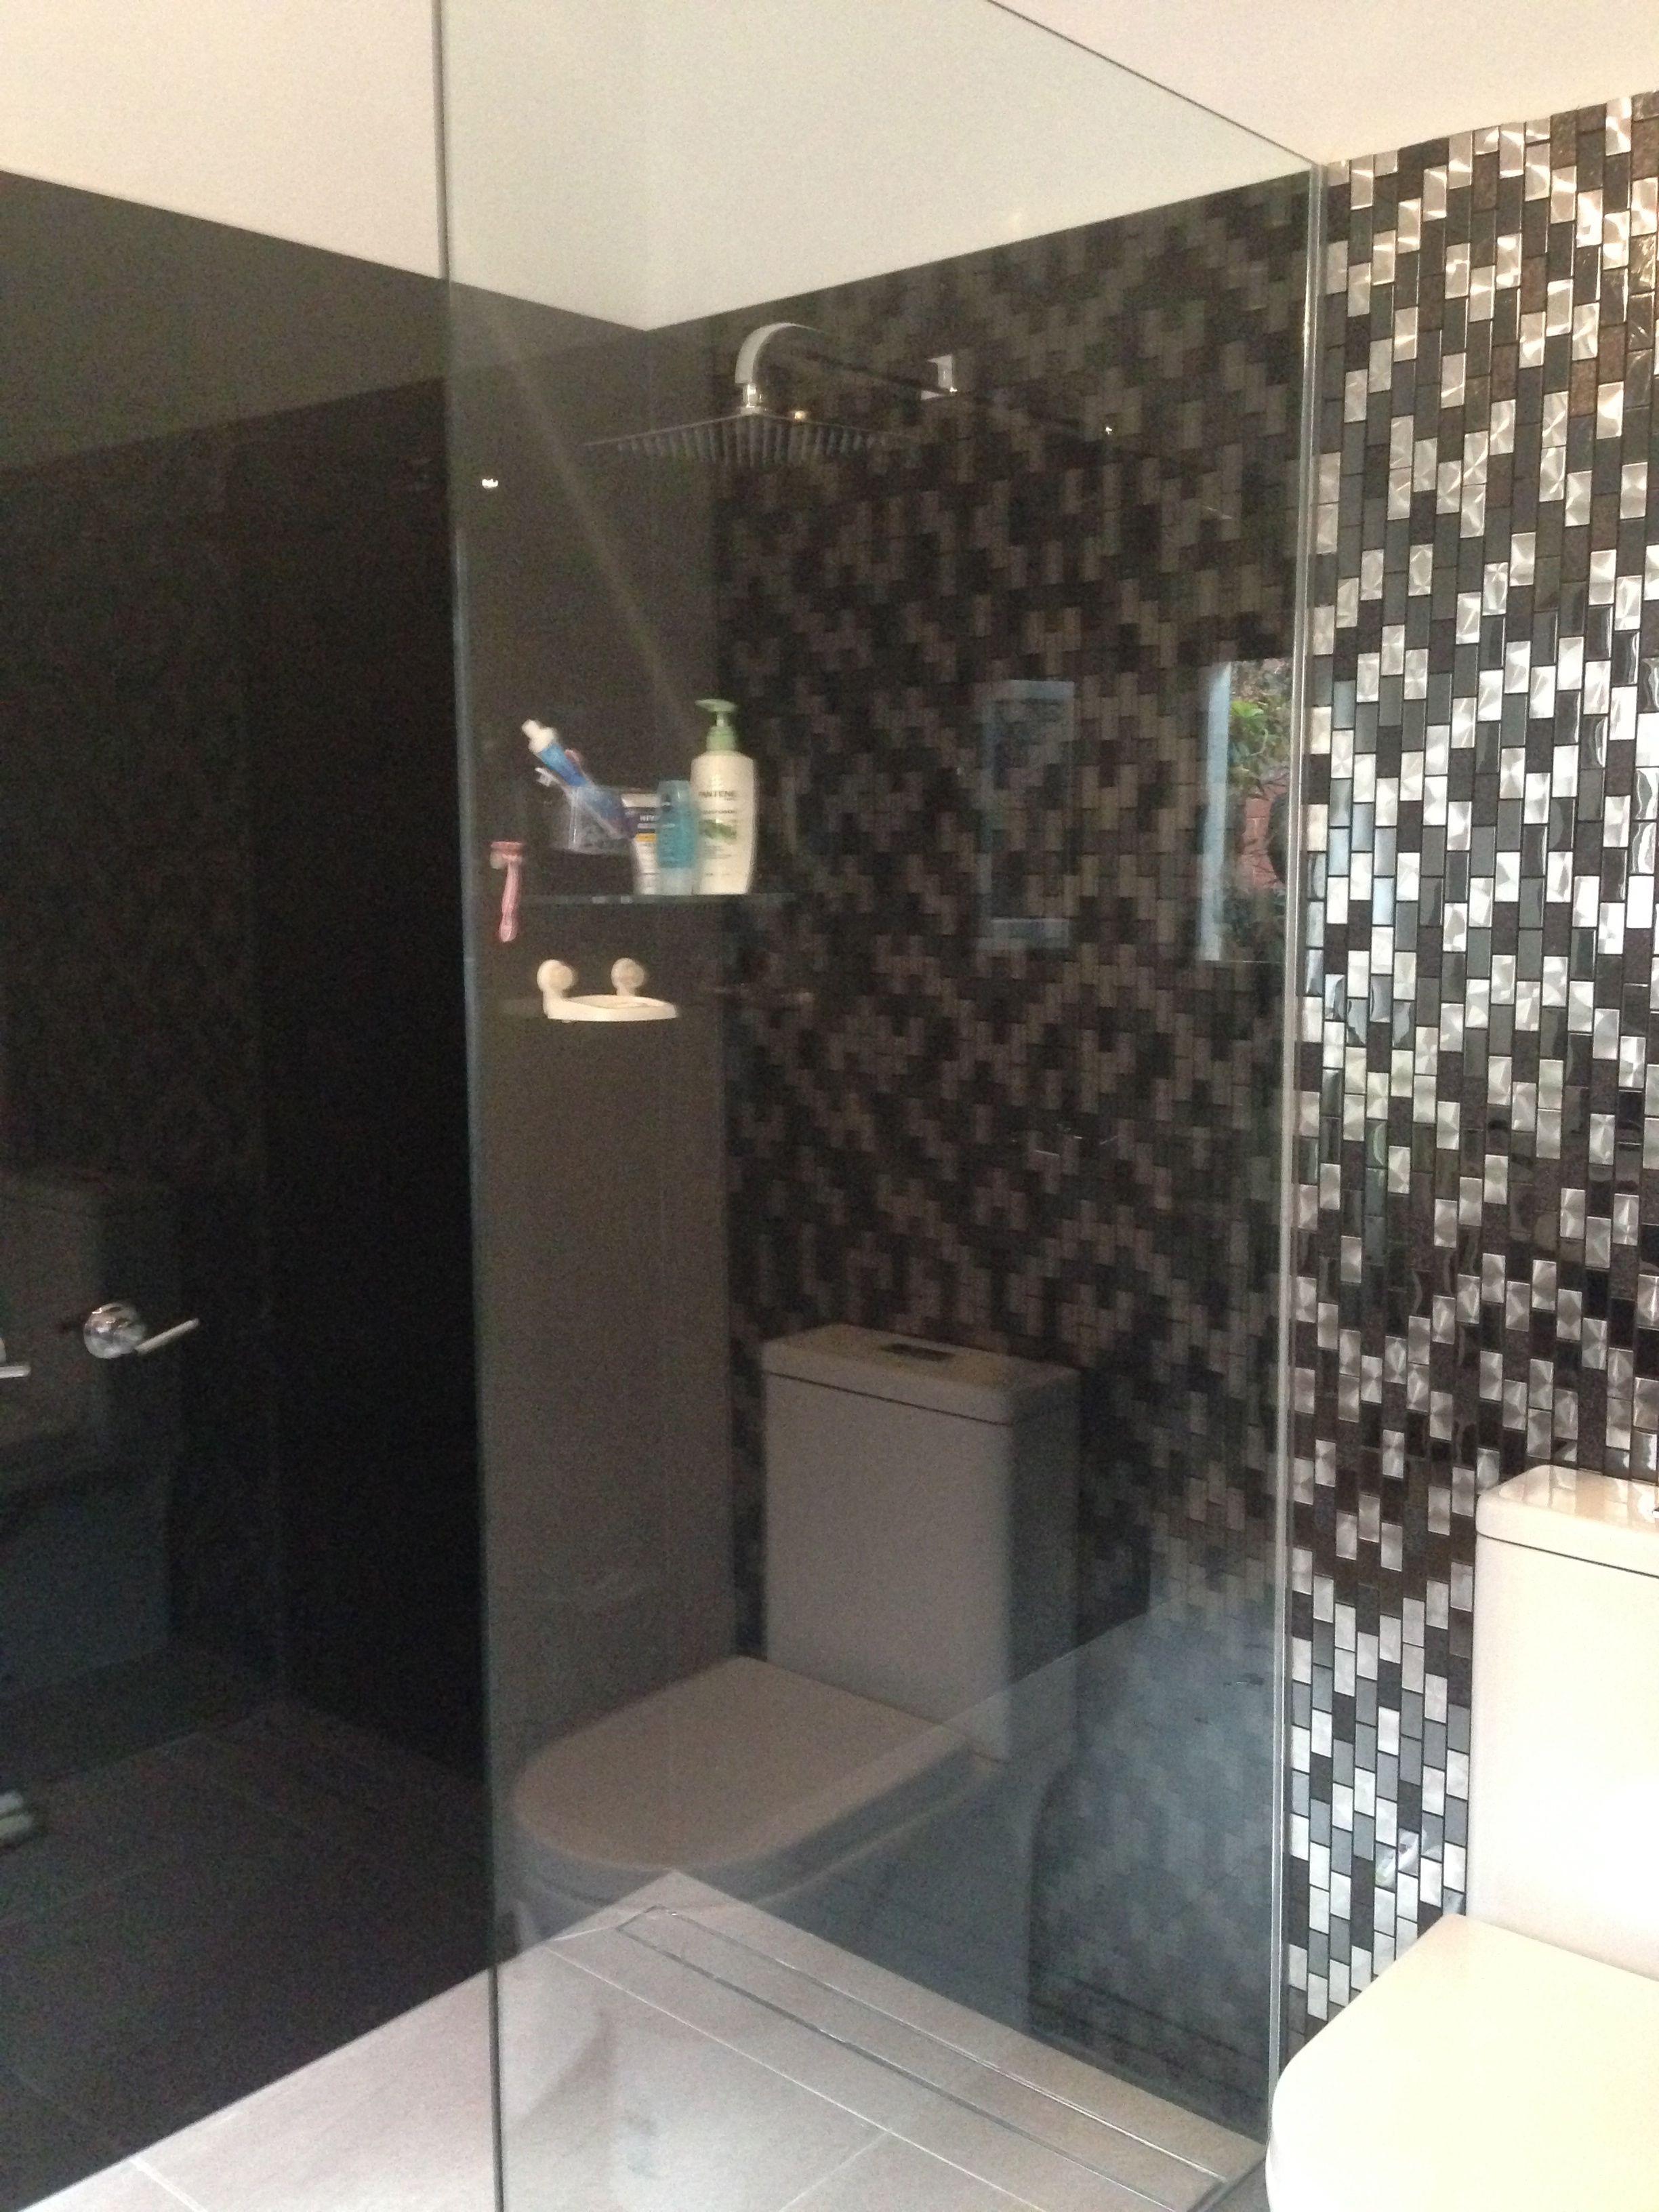 Glass Splashbacks Bathroom Walls Black Coloured Glass Splashbacks In Shower Bathroom Glass